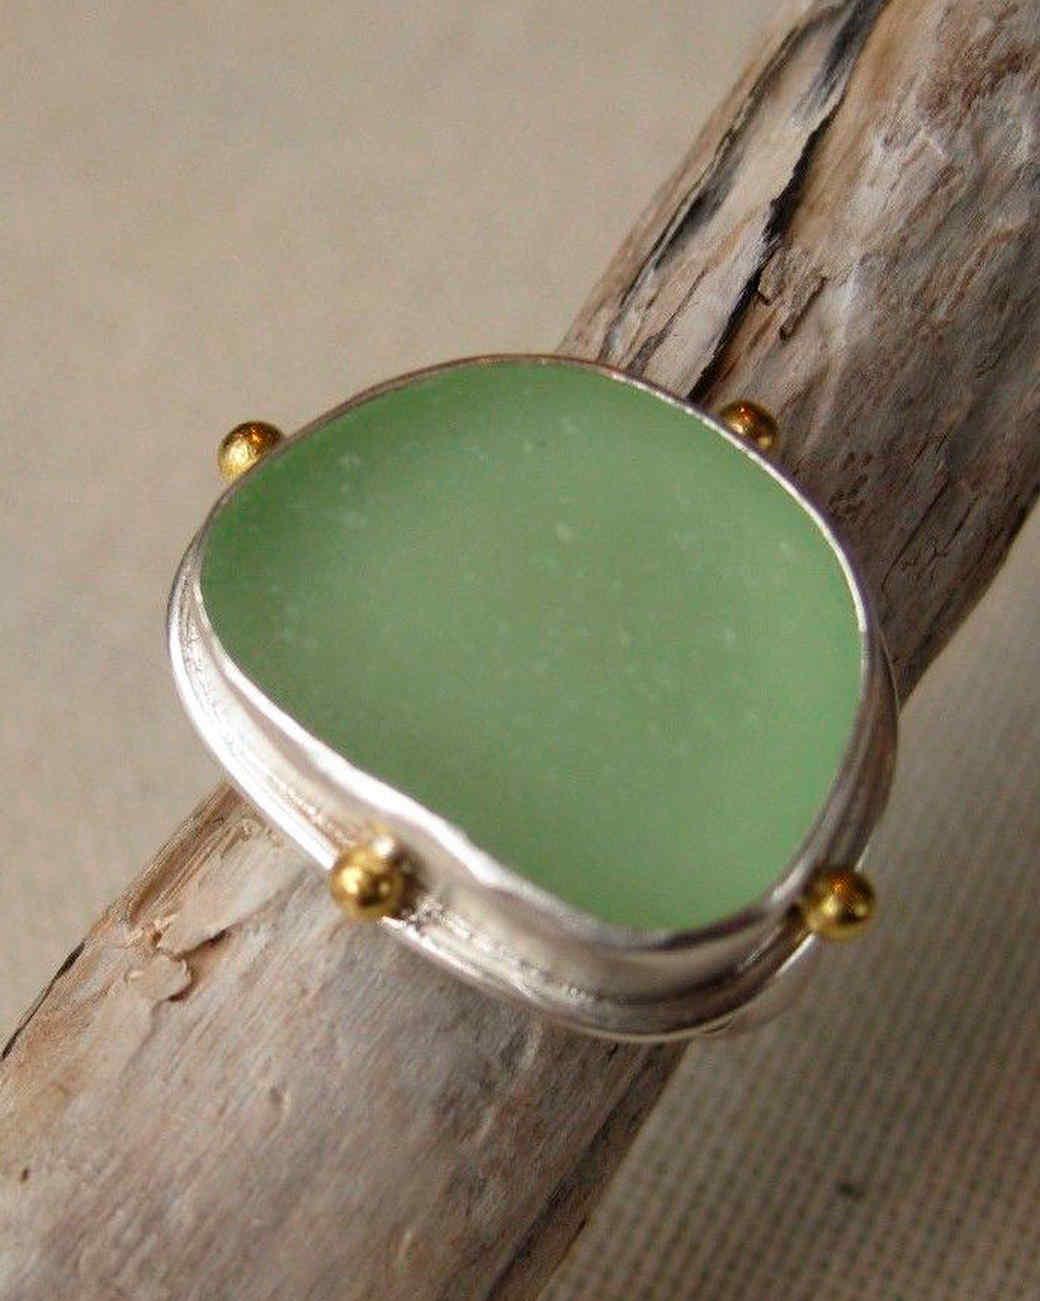 lisa-hall-jewelry-seaglass-compass-ring1015.jpg